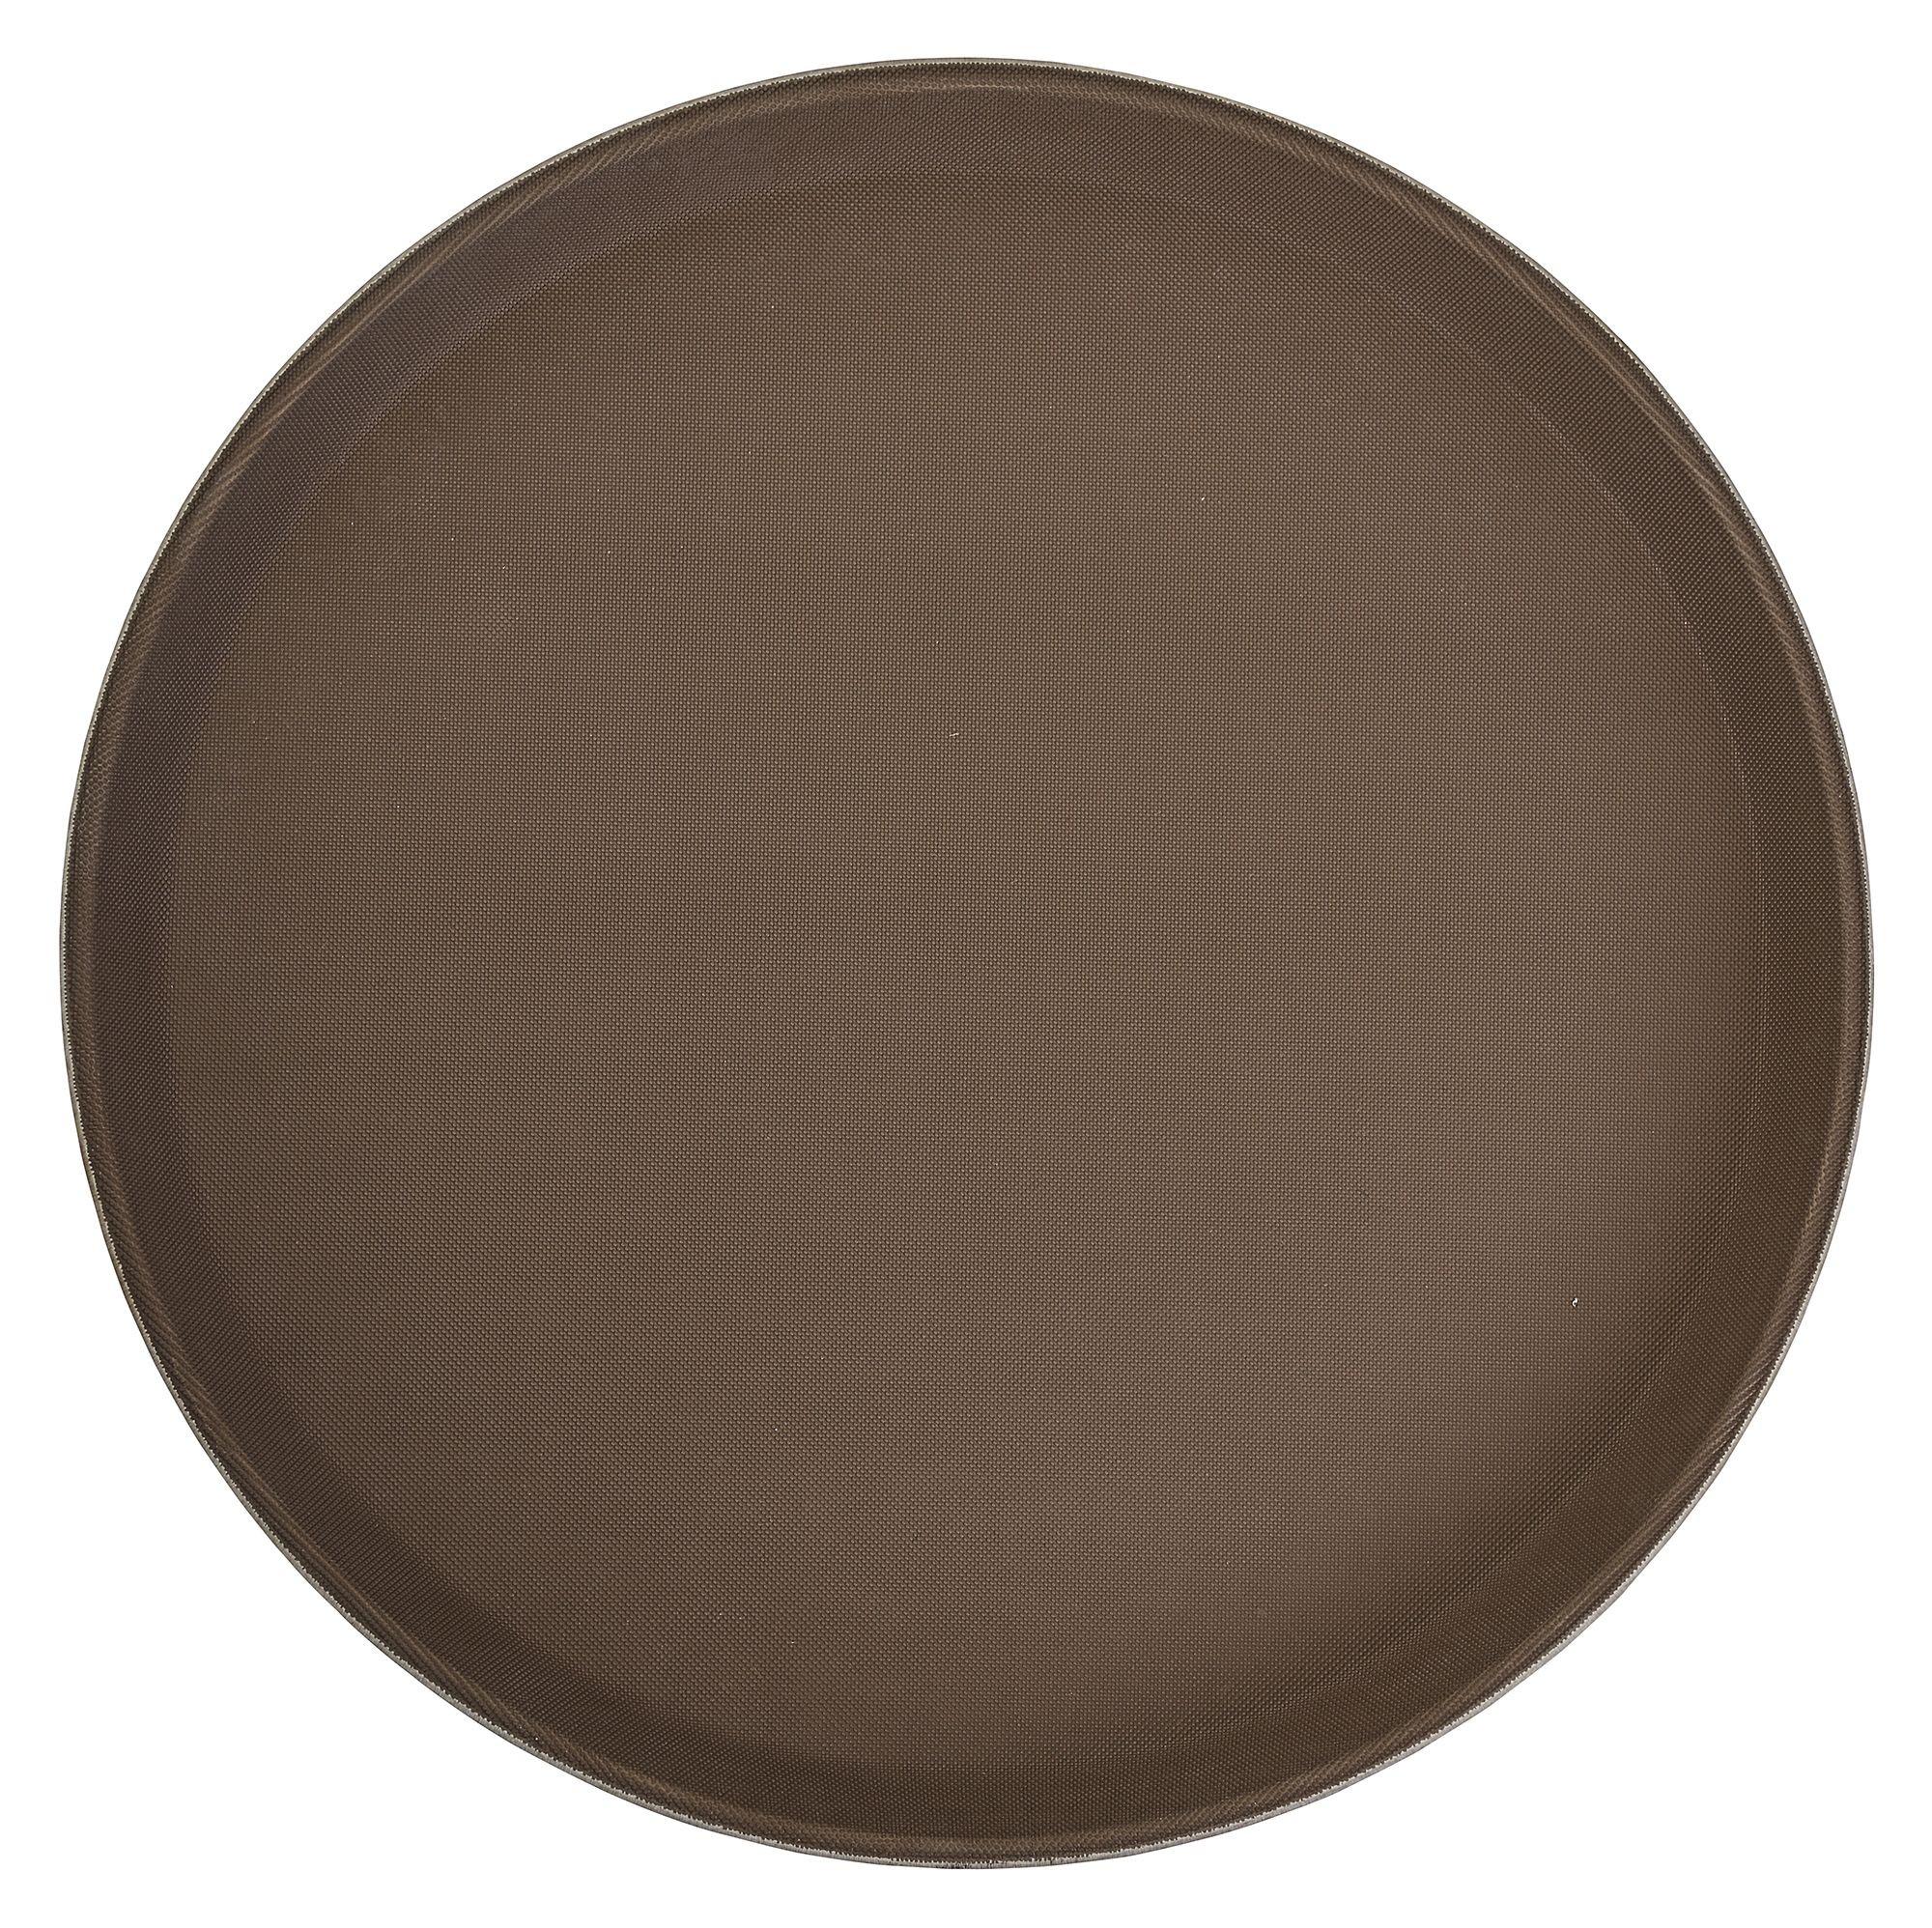 "Winco TFG-16N Brown Round Non-Slip Fiberglass Tray 16"""